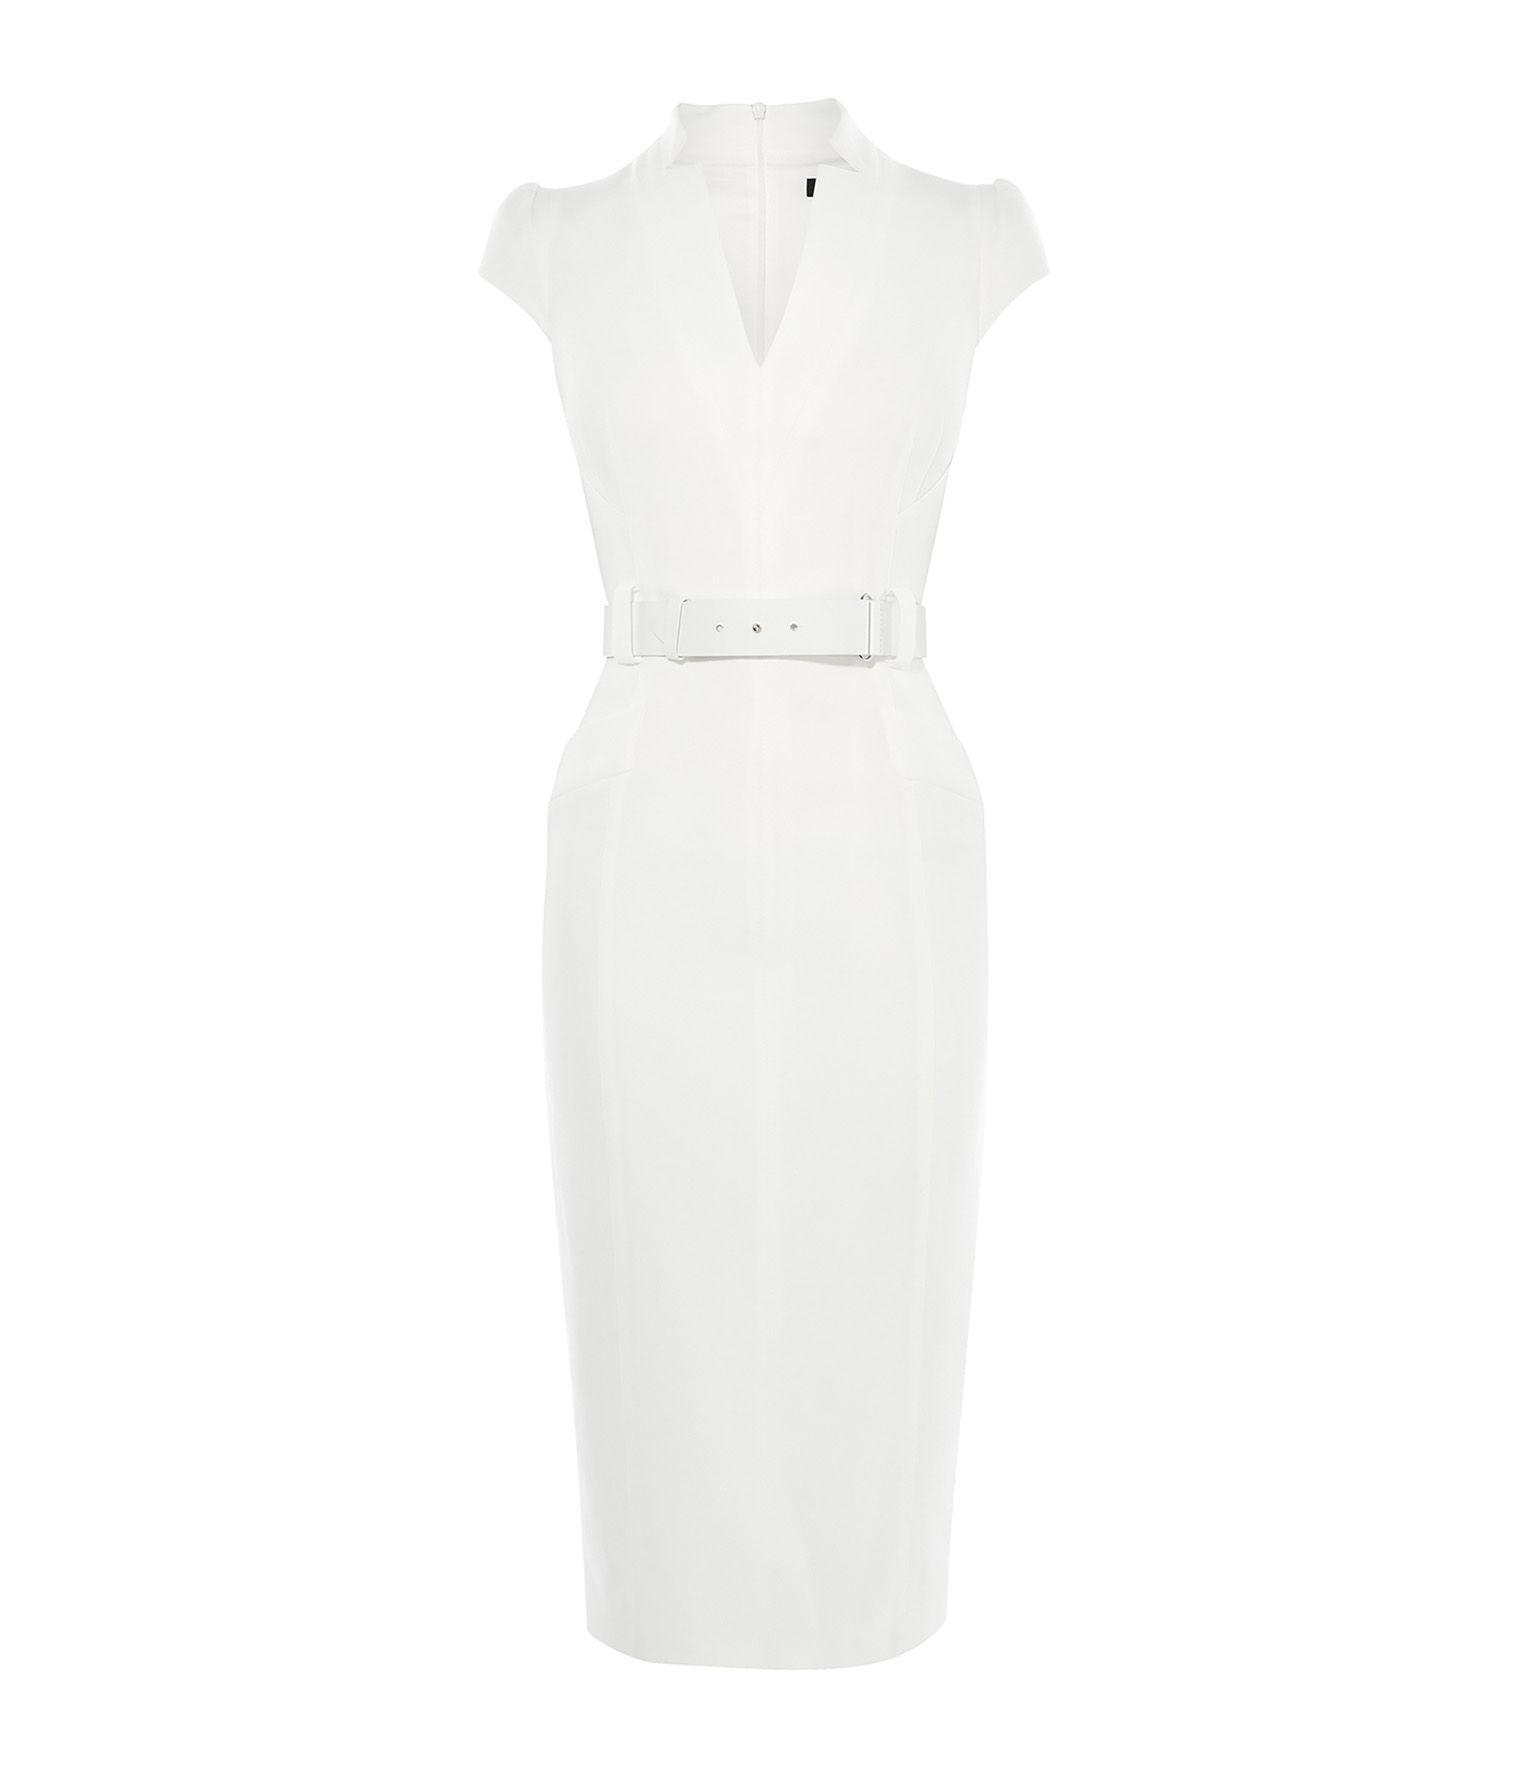 871246917ac40 Karen Millen Tailored Belted Pencil Dress in White - Lyst